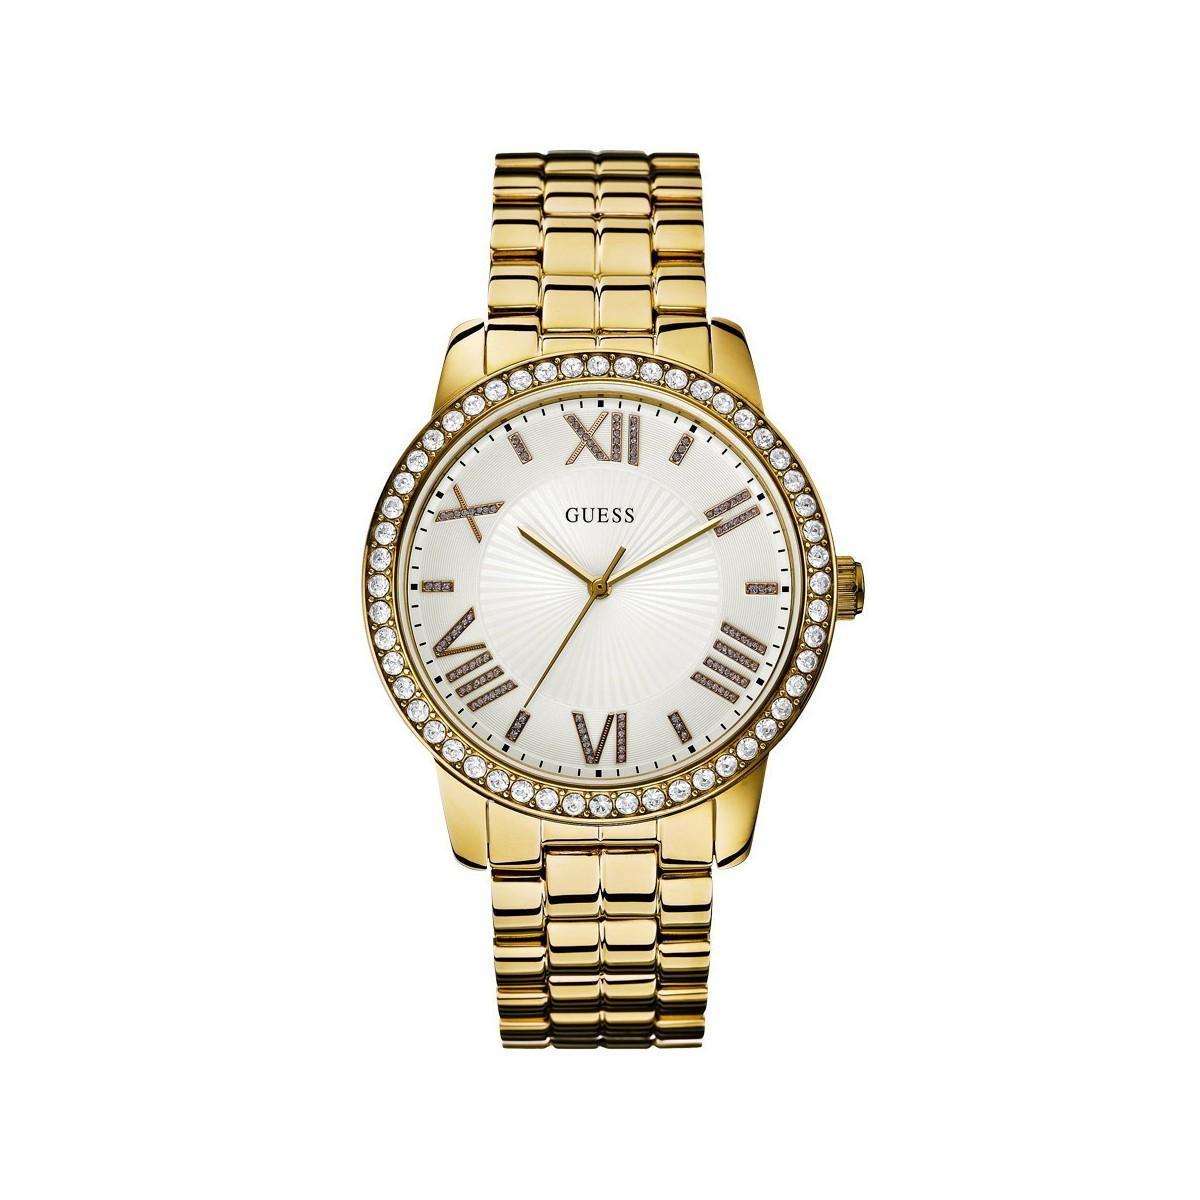 https://www.gaberjoyeria.com/2664-thickbox_default/reloj-guess-w0329l2.jpg